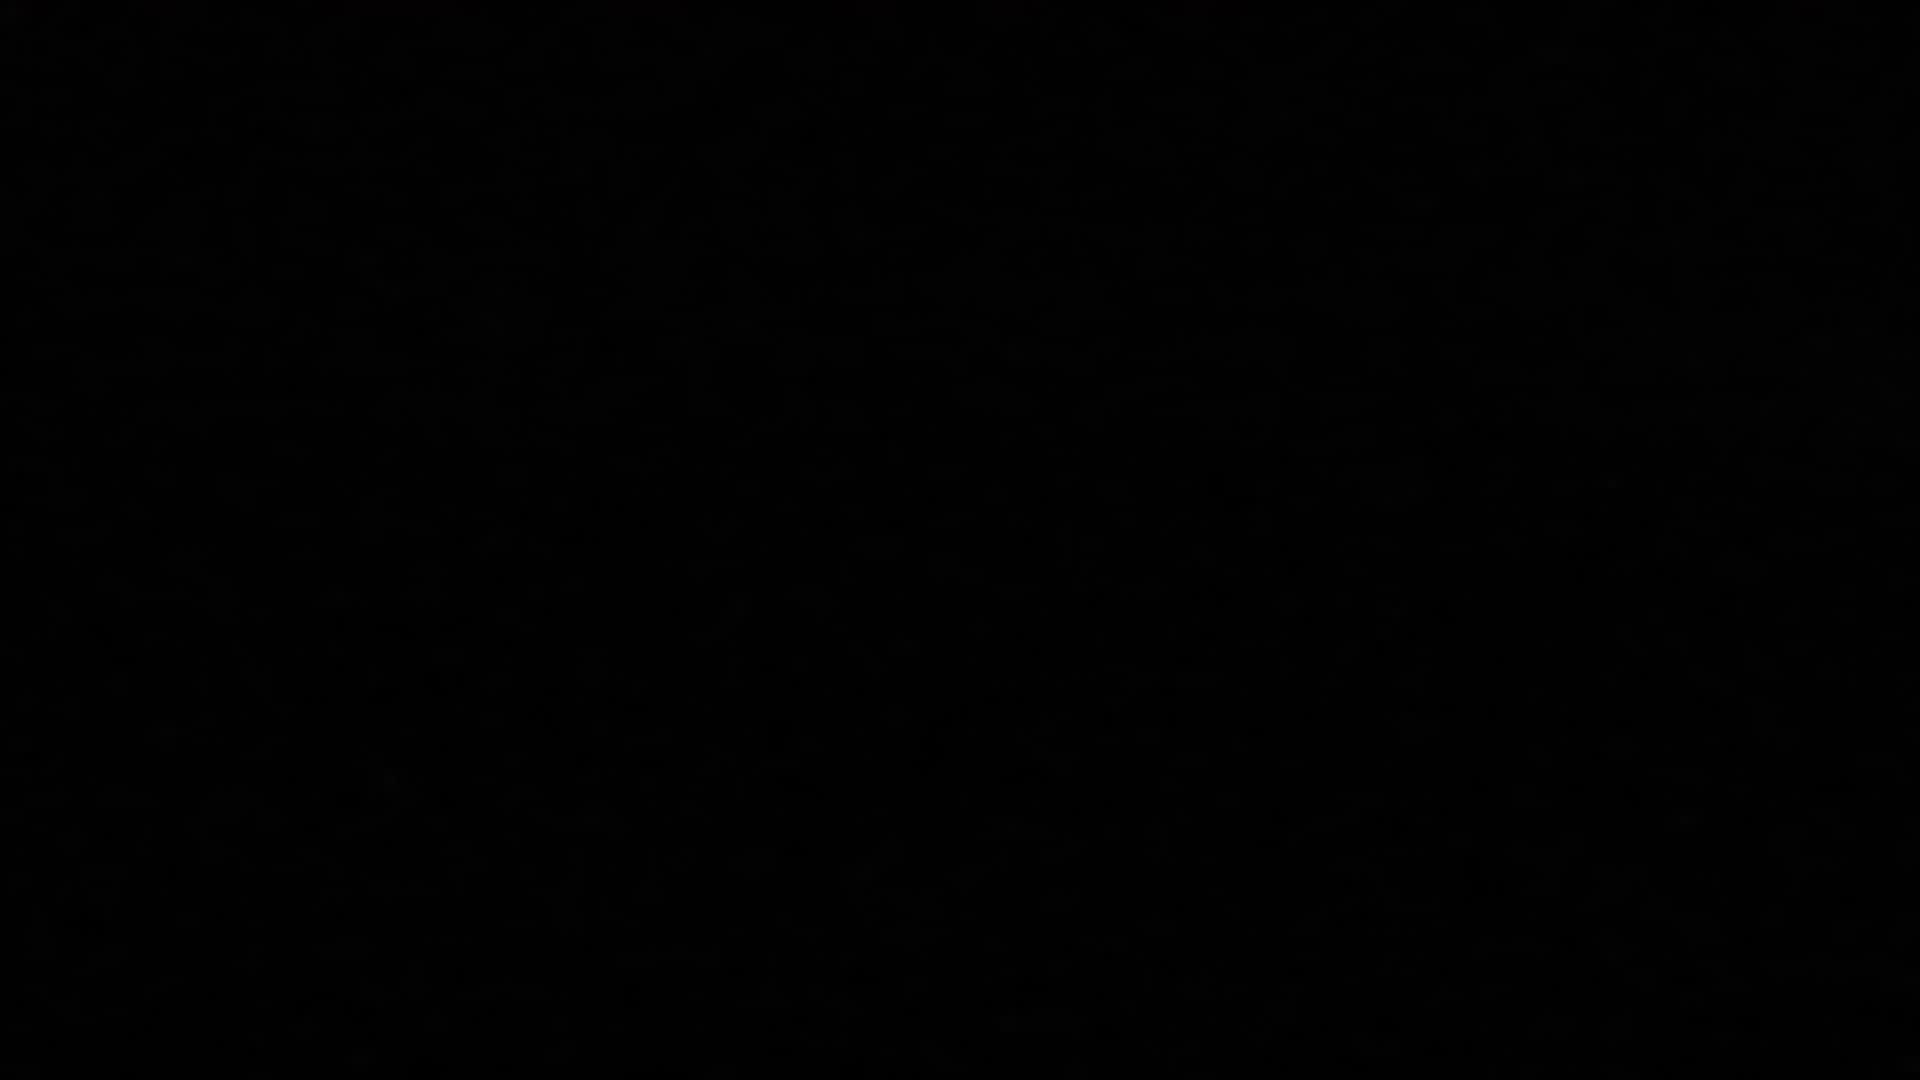 SPYさん初投稿!マンション覗き!5000K!ハイビジョン撮影VOL.05(元サッカー部員社会人) 自慰  75連発 55